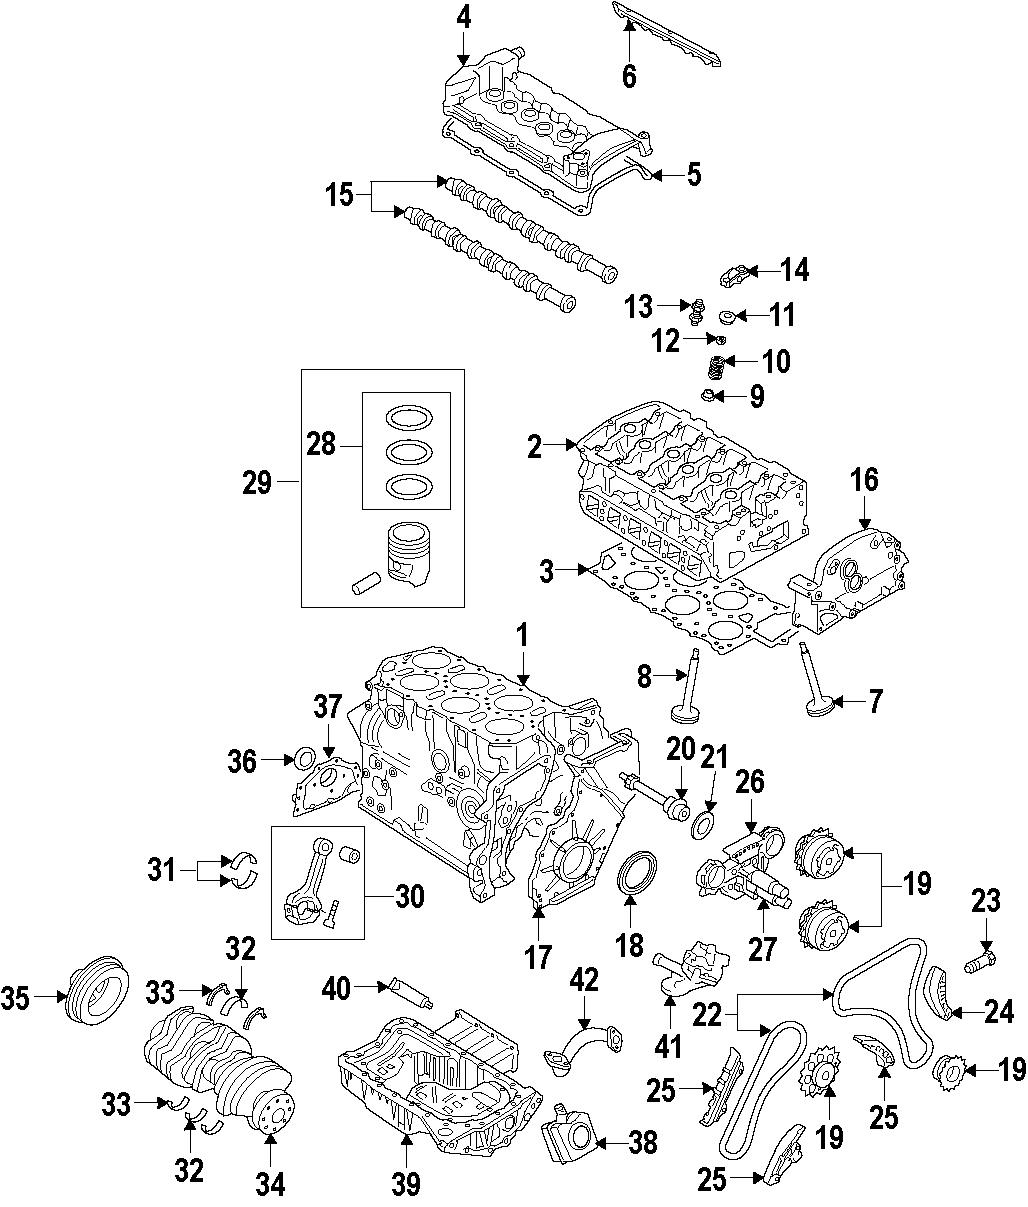 tags: #vw bus wiring diagram#vw alternator wiring diagram#1973 vw beetle wiring  diagram#vw buggy wiring diagram#vw engine 3d diagram#vw golf wiring